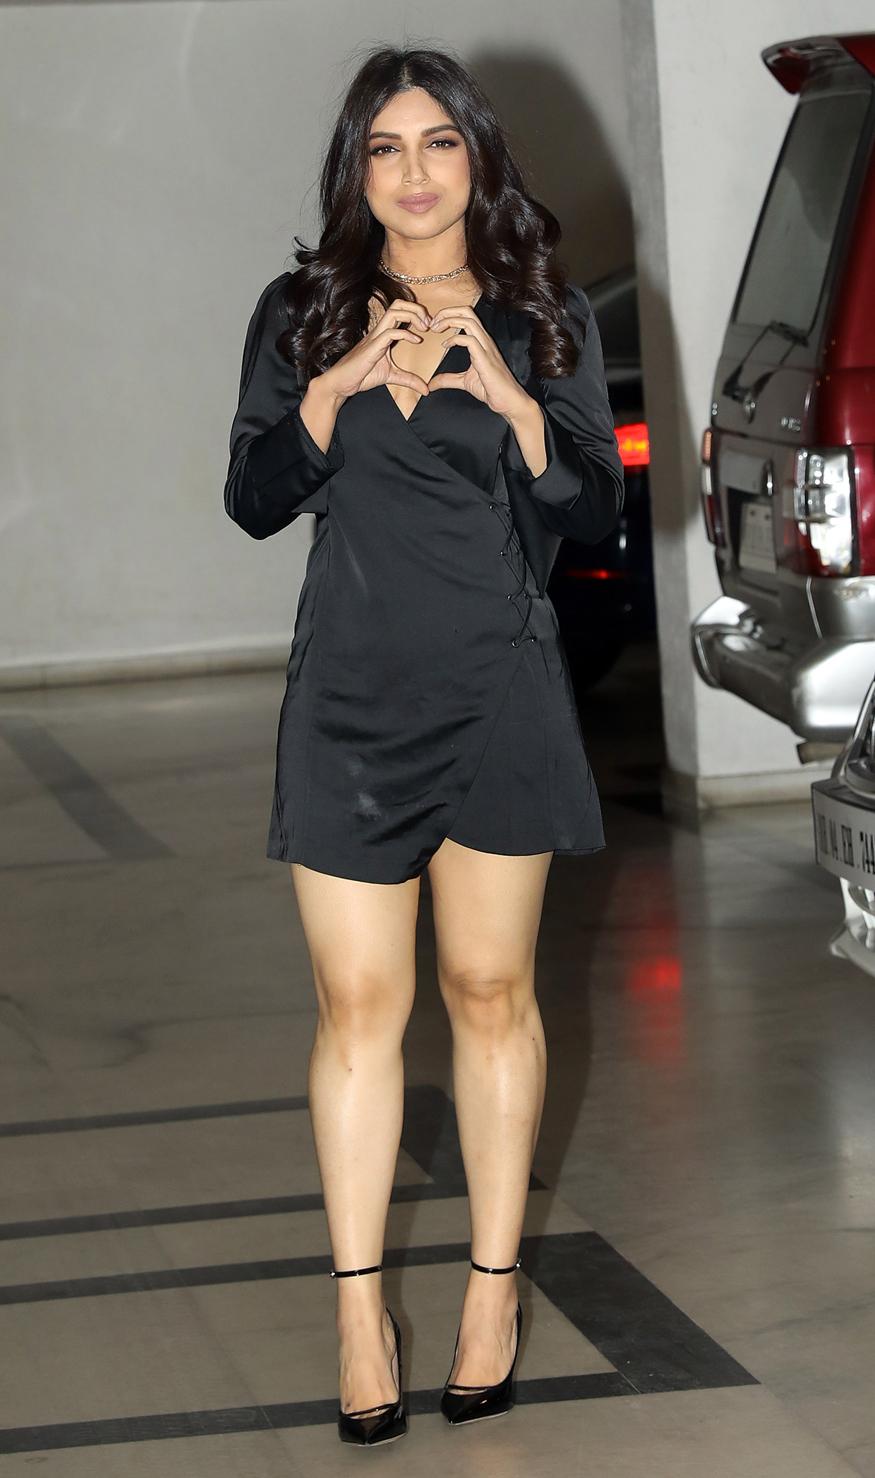 Bhumi Pednekar gestures as she arrives for 'Singles Only' party hosted by filmmaker Karan Johar at his residence in Mumbai on February 14, 2018. (Image: Yogen Shah)